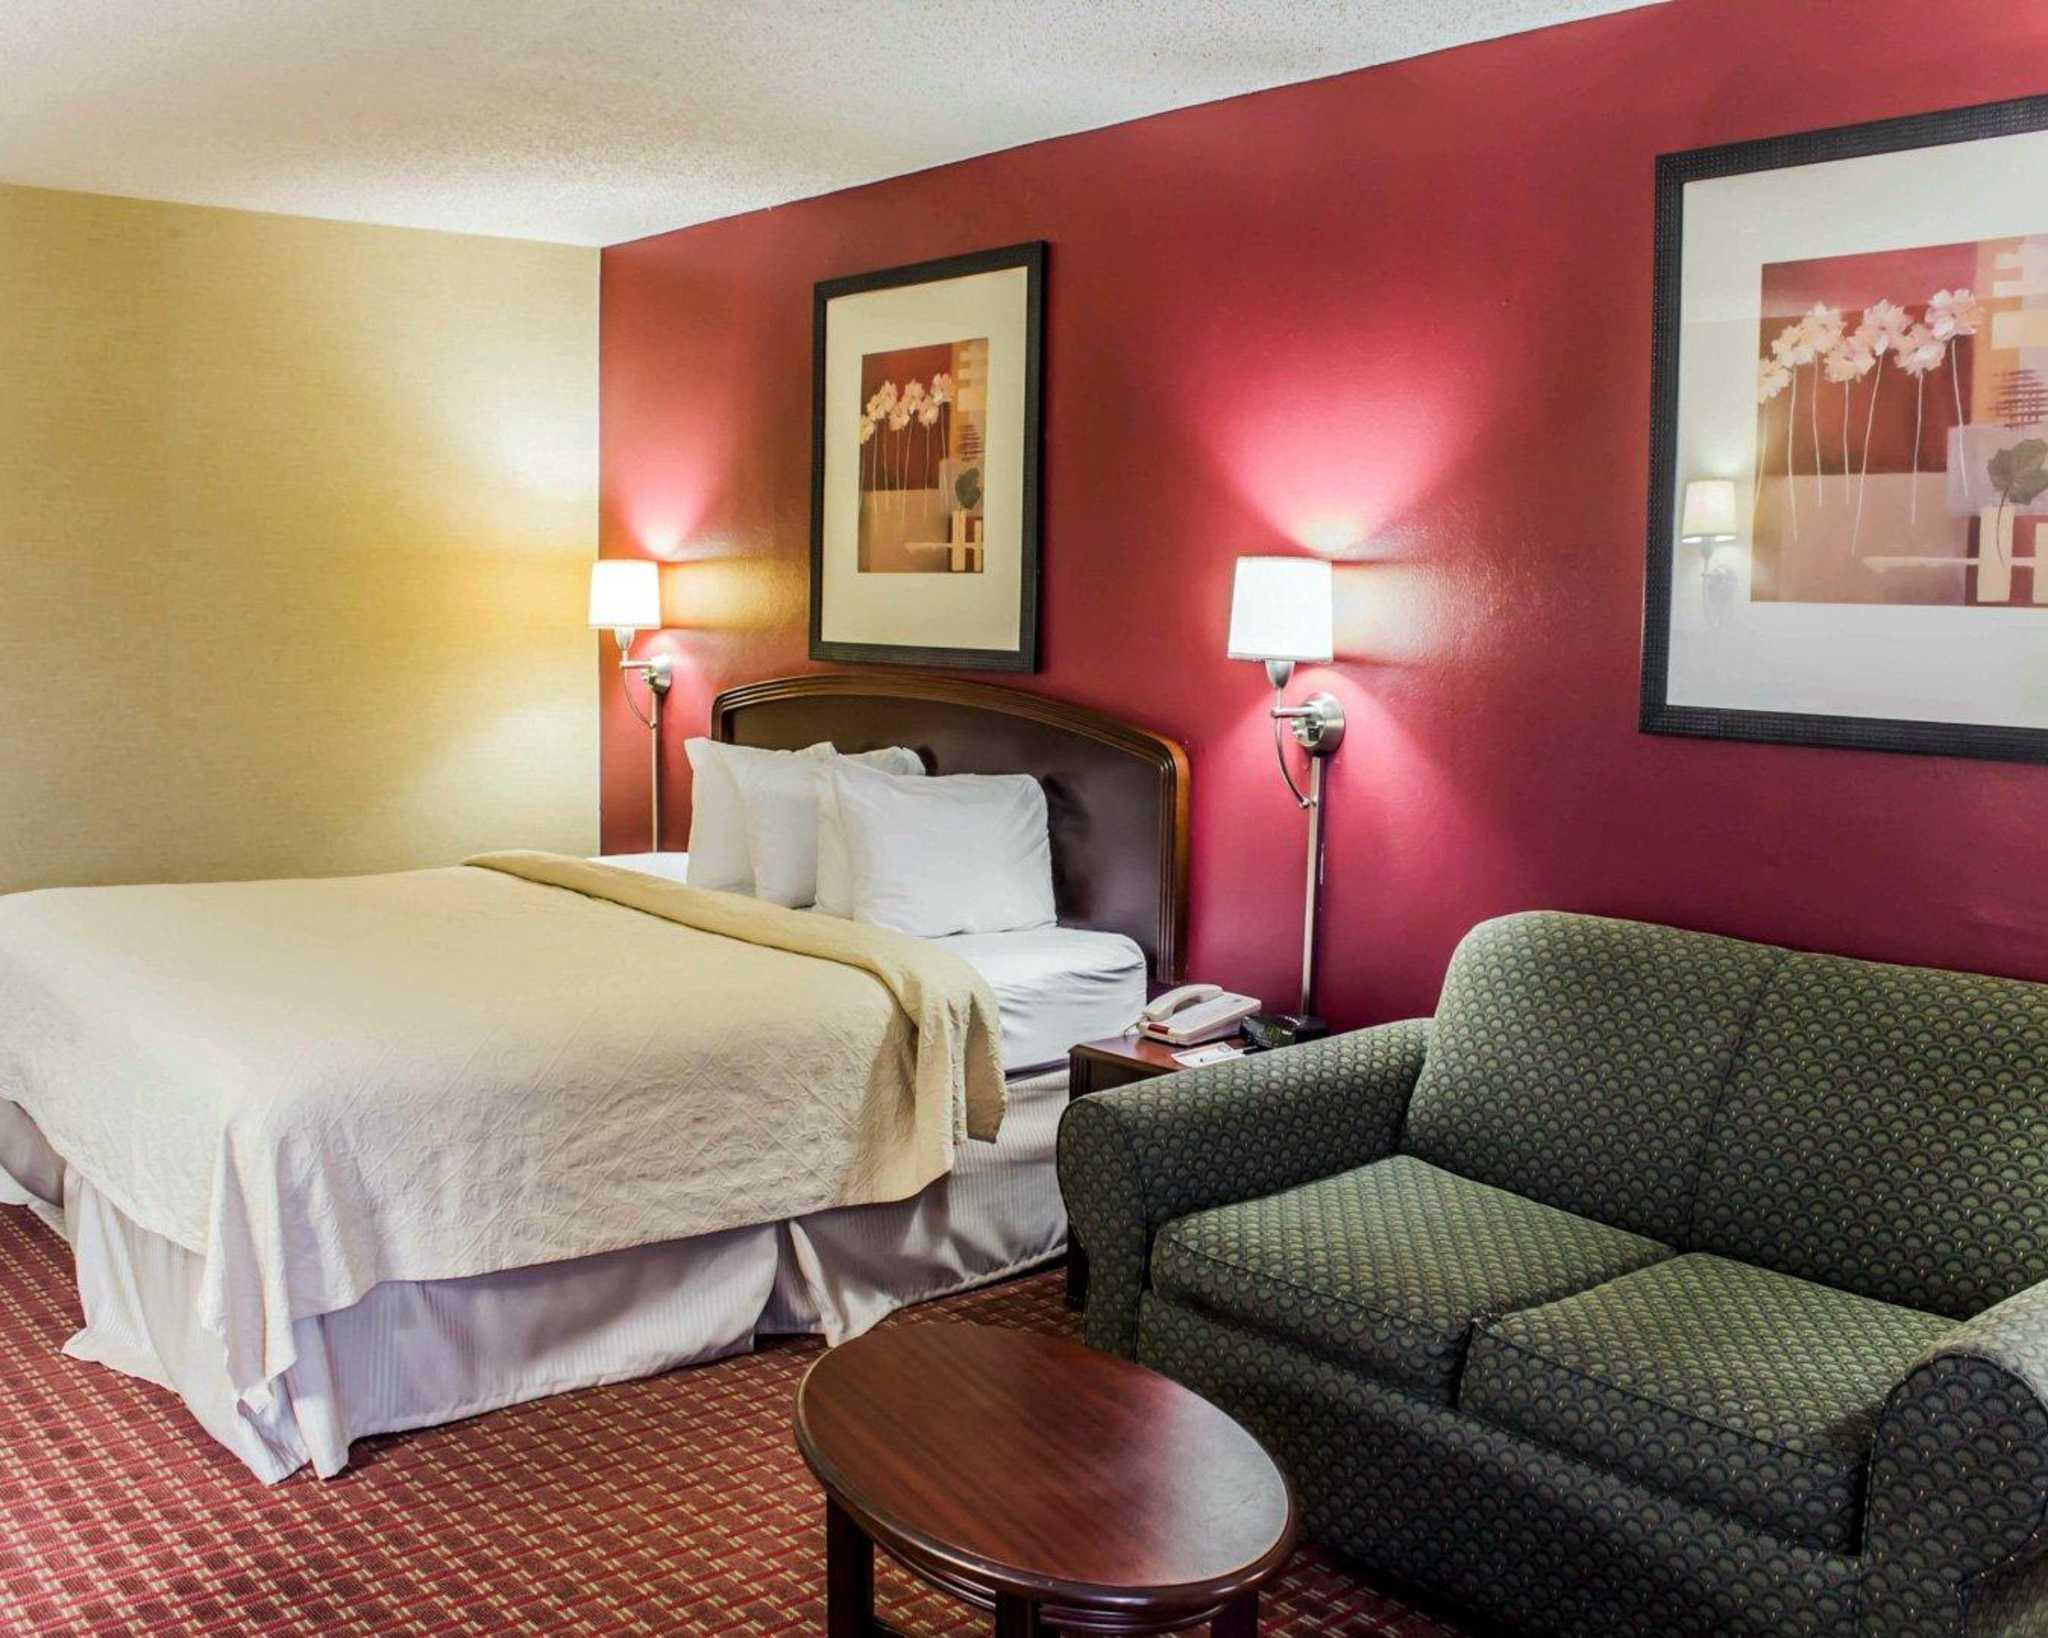 Quality Inn Roanoke near Lake Gaston image 11